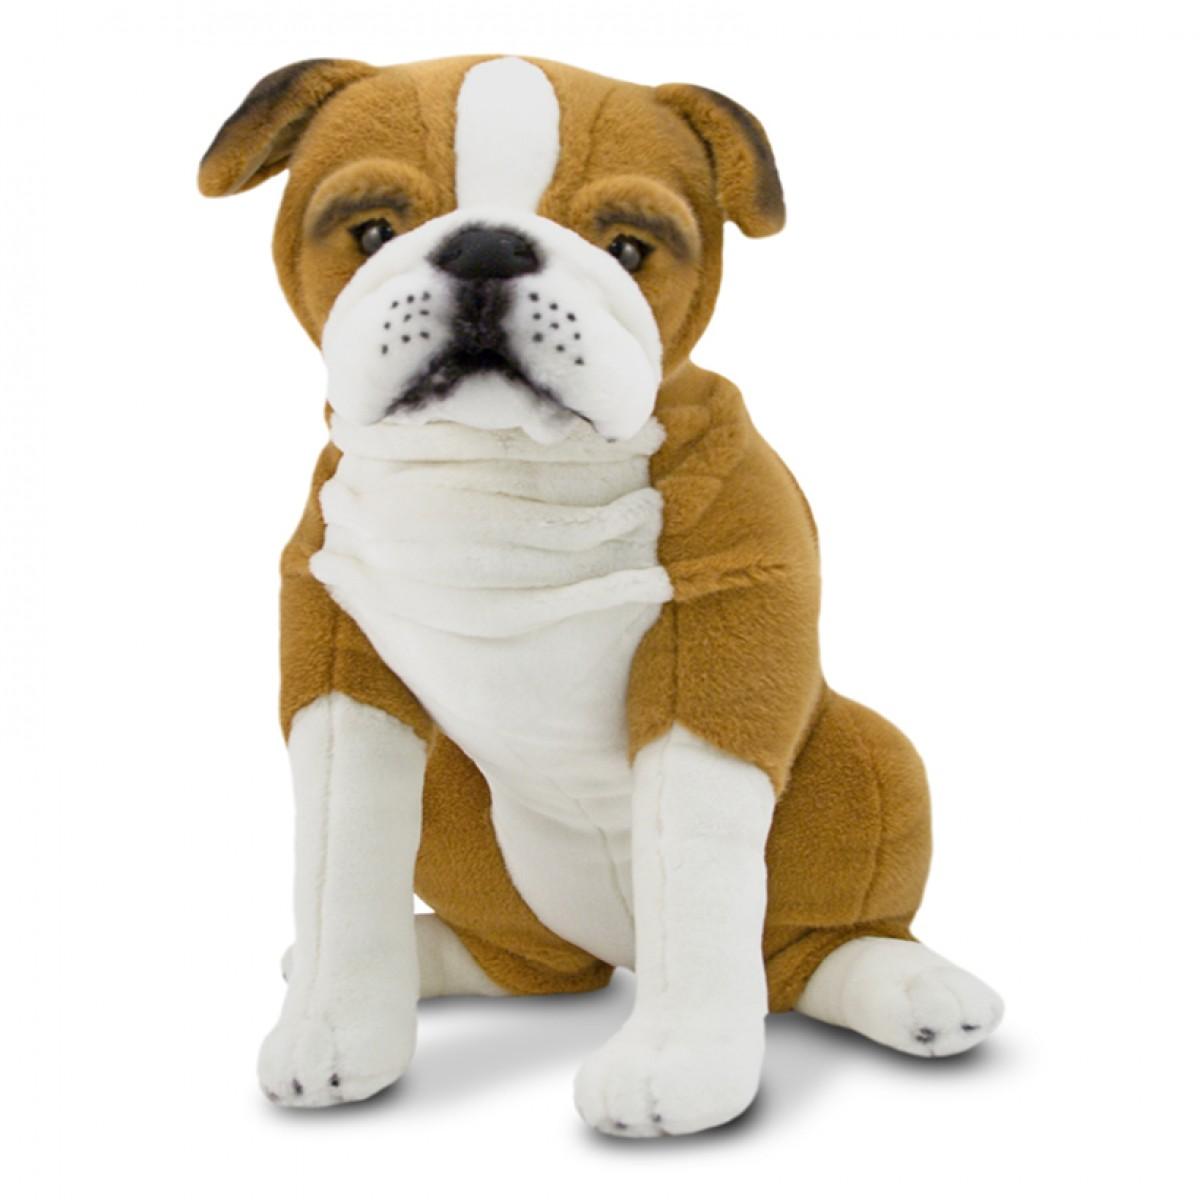 Toy Bulldog Dog: Toy Melissa Doug English Bulldog Plush Soft Toy Breed